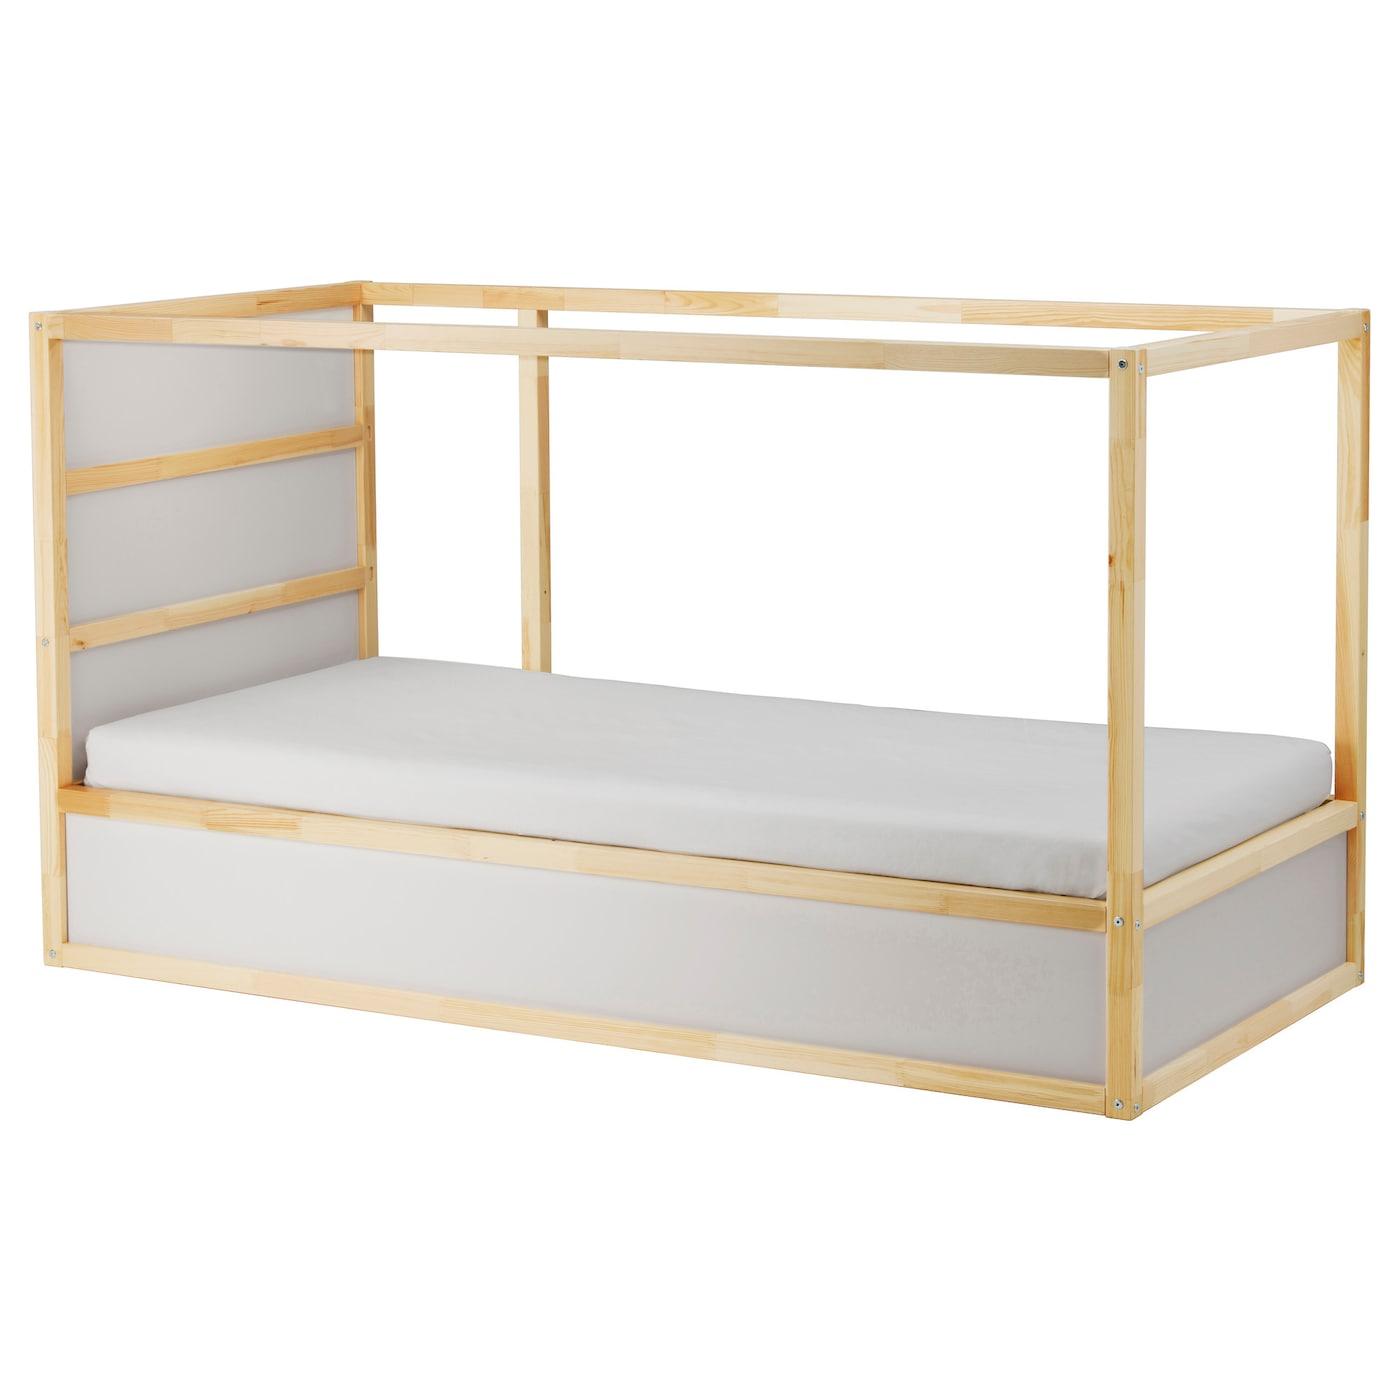 Picture of: Kura White Pine Reversible Bed 90×200 Cm Ikea